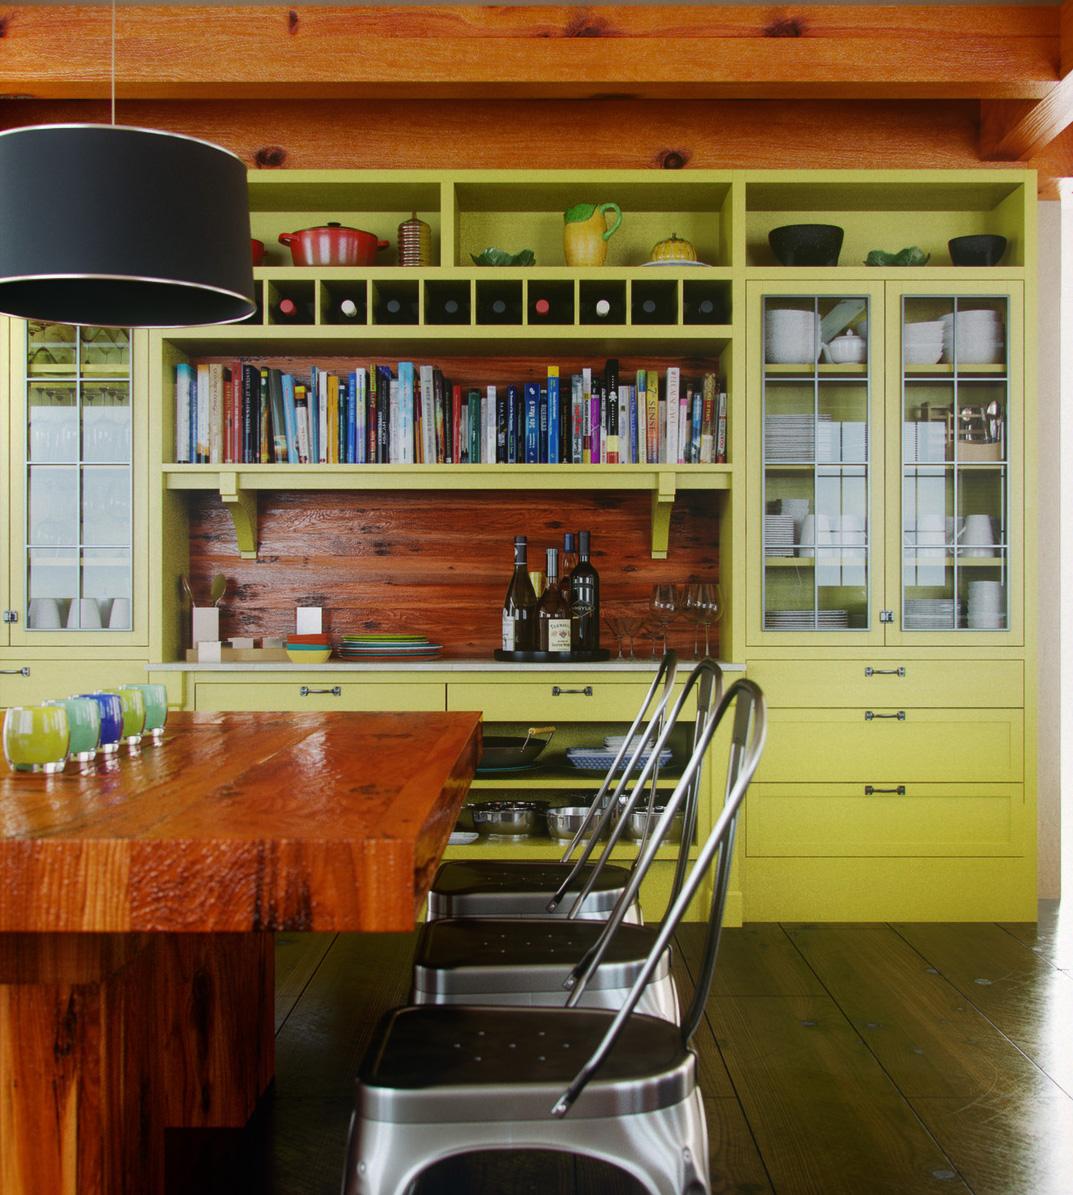 Modern kitchen interior design evermotion competition 2011 cg projects 3d archviz - Kitchen design competition ...